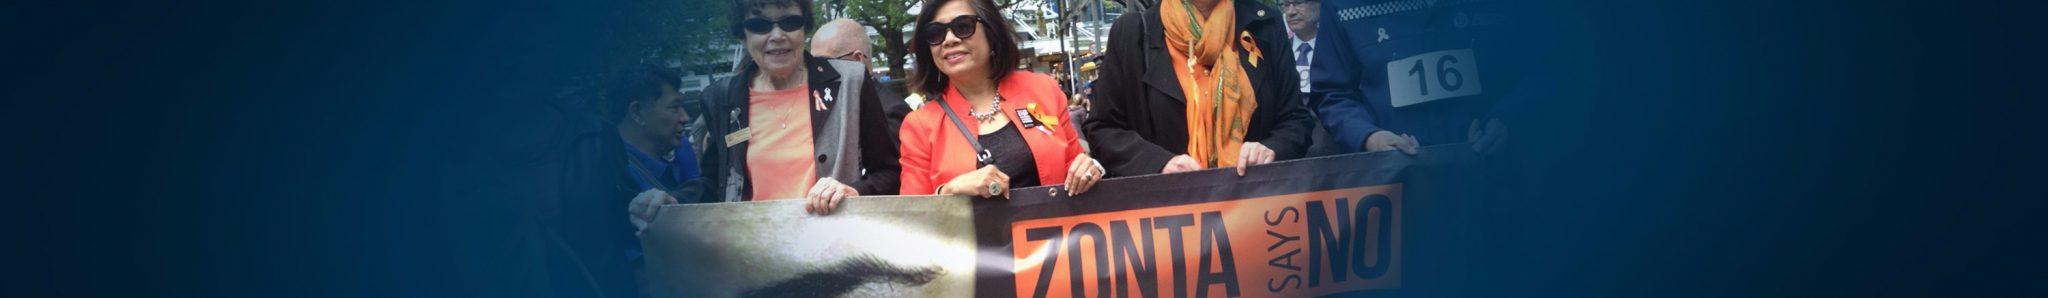 zonta-home-banner03